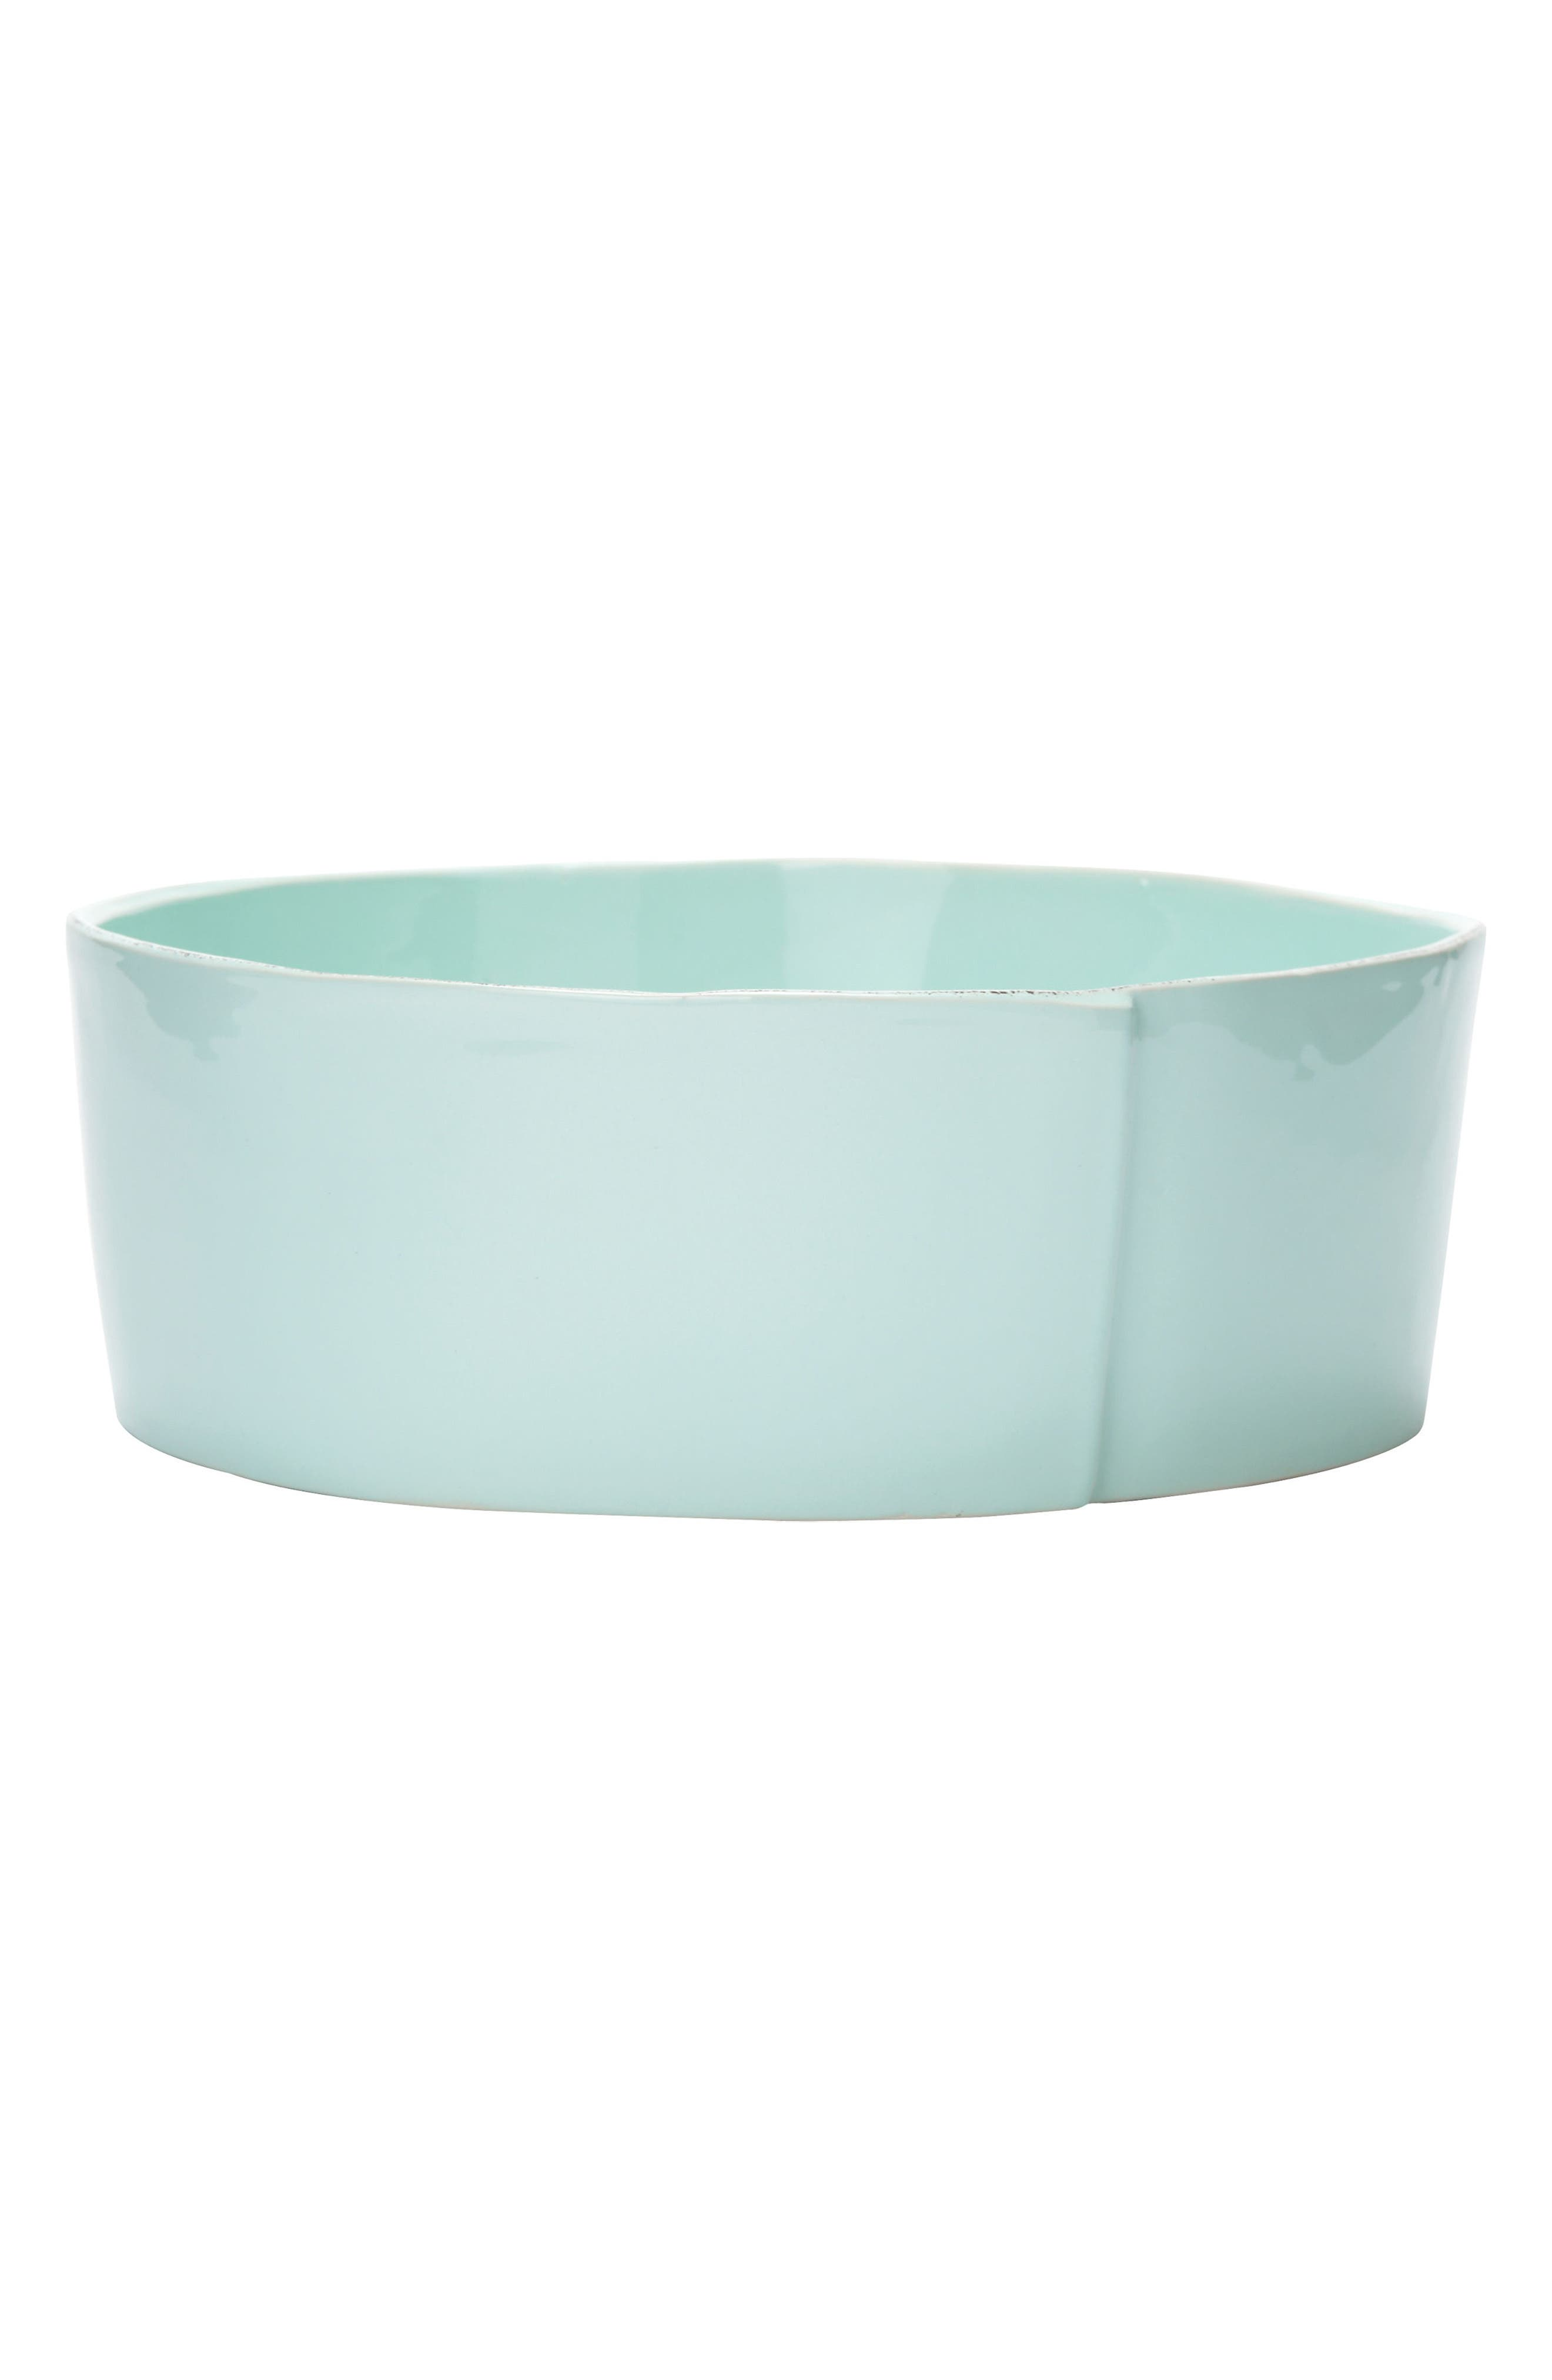 Lastra Serving Bowl,                             Main thumbnail 1, color,                             Aqua - Large